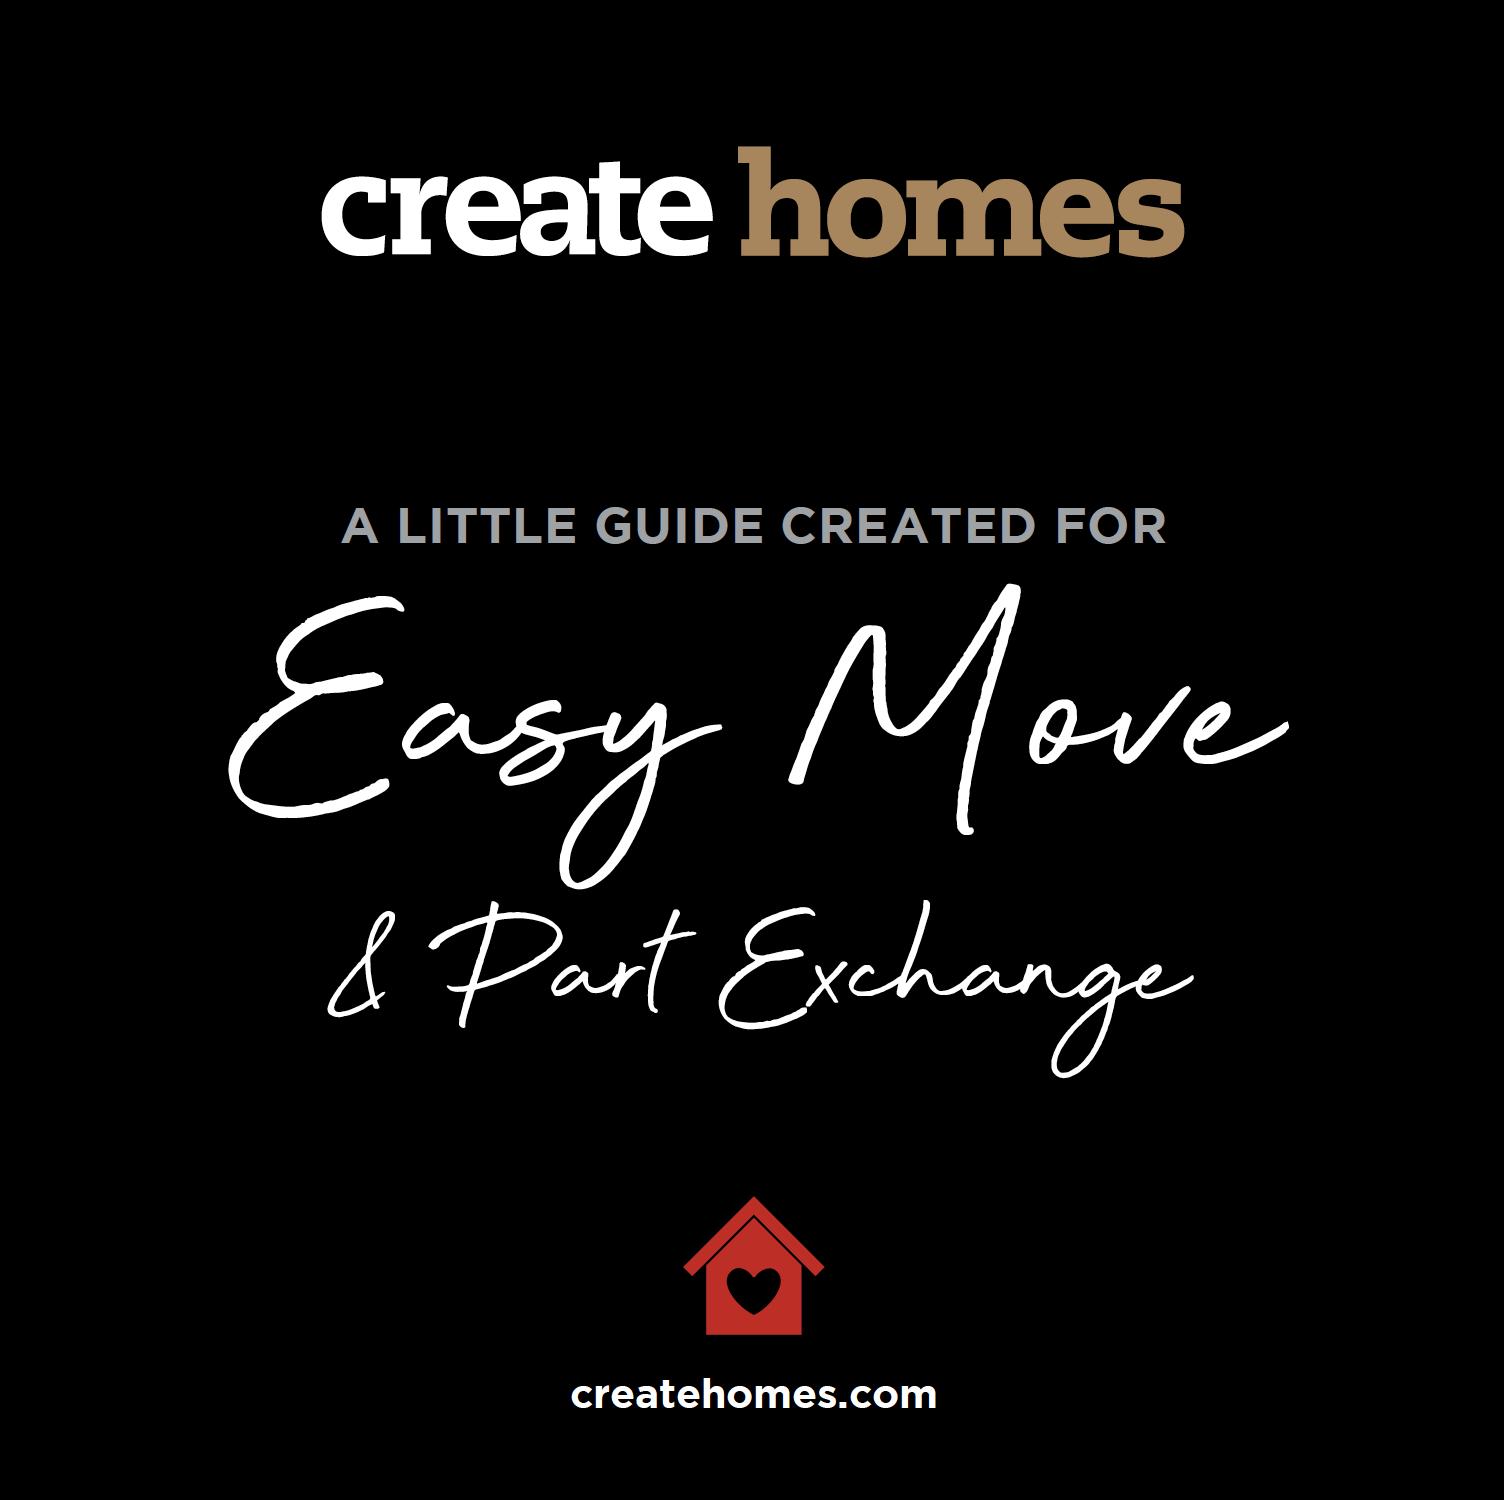 Easy Move & Part Exchange | Create Homes